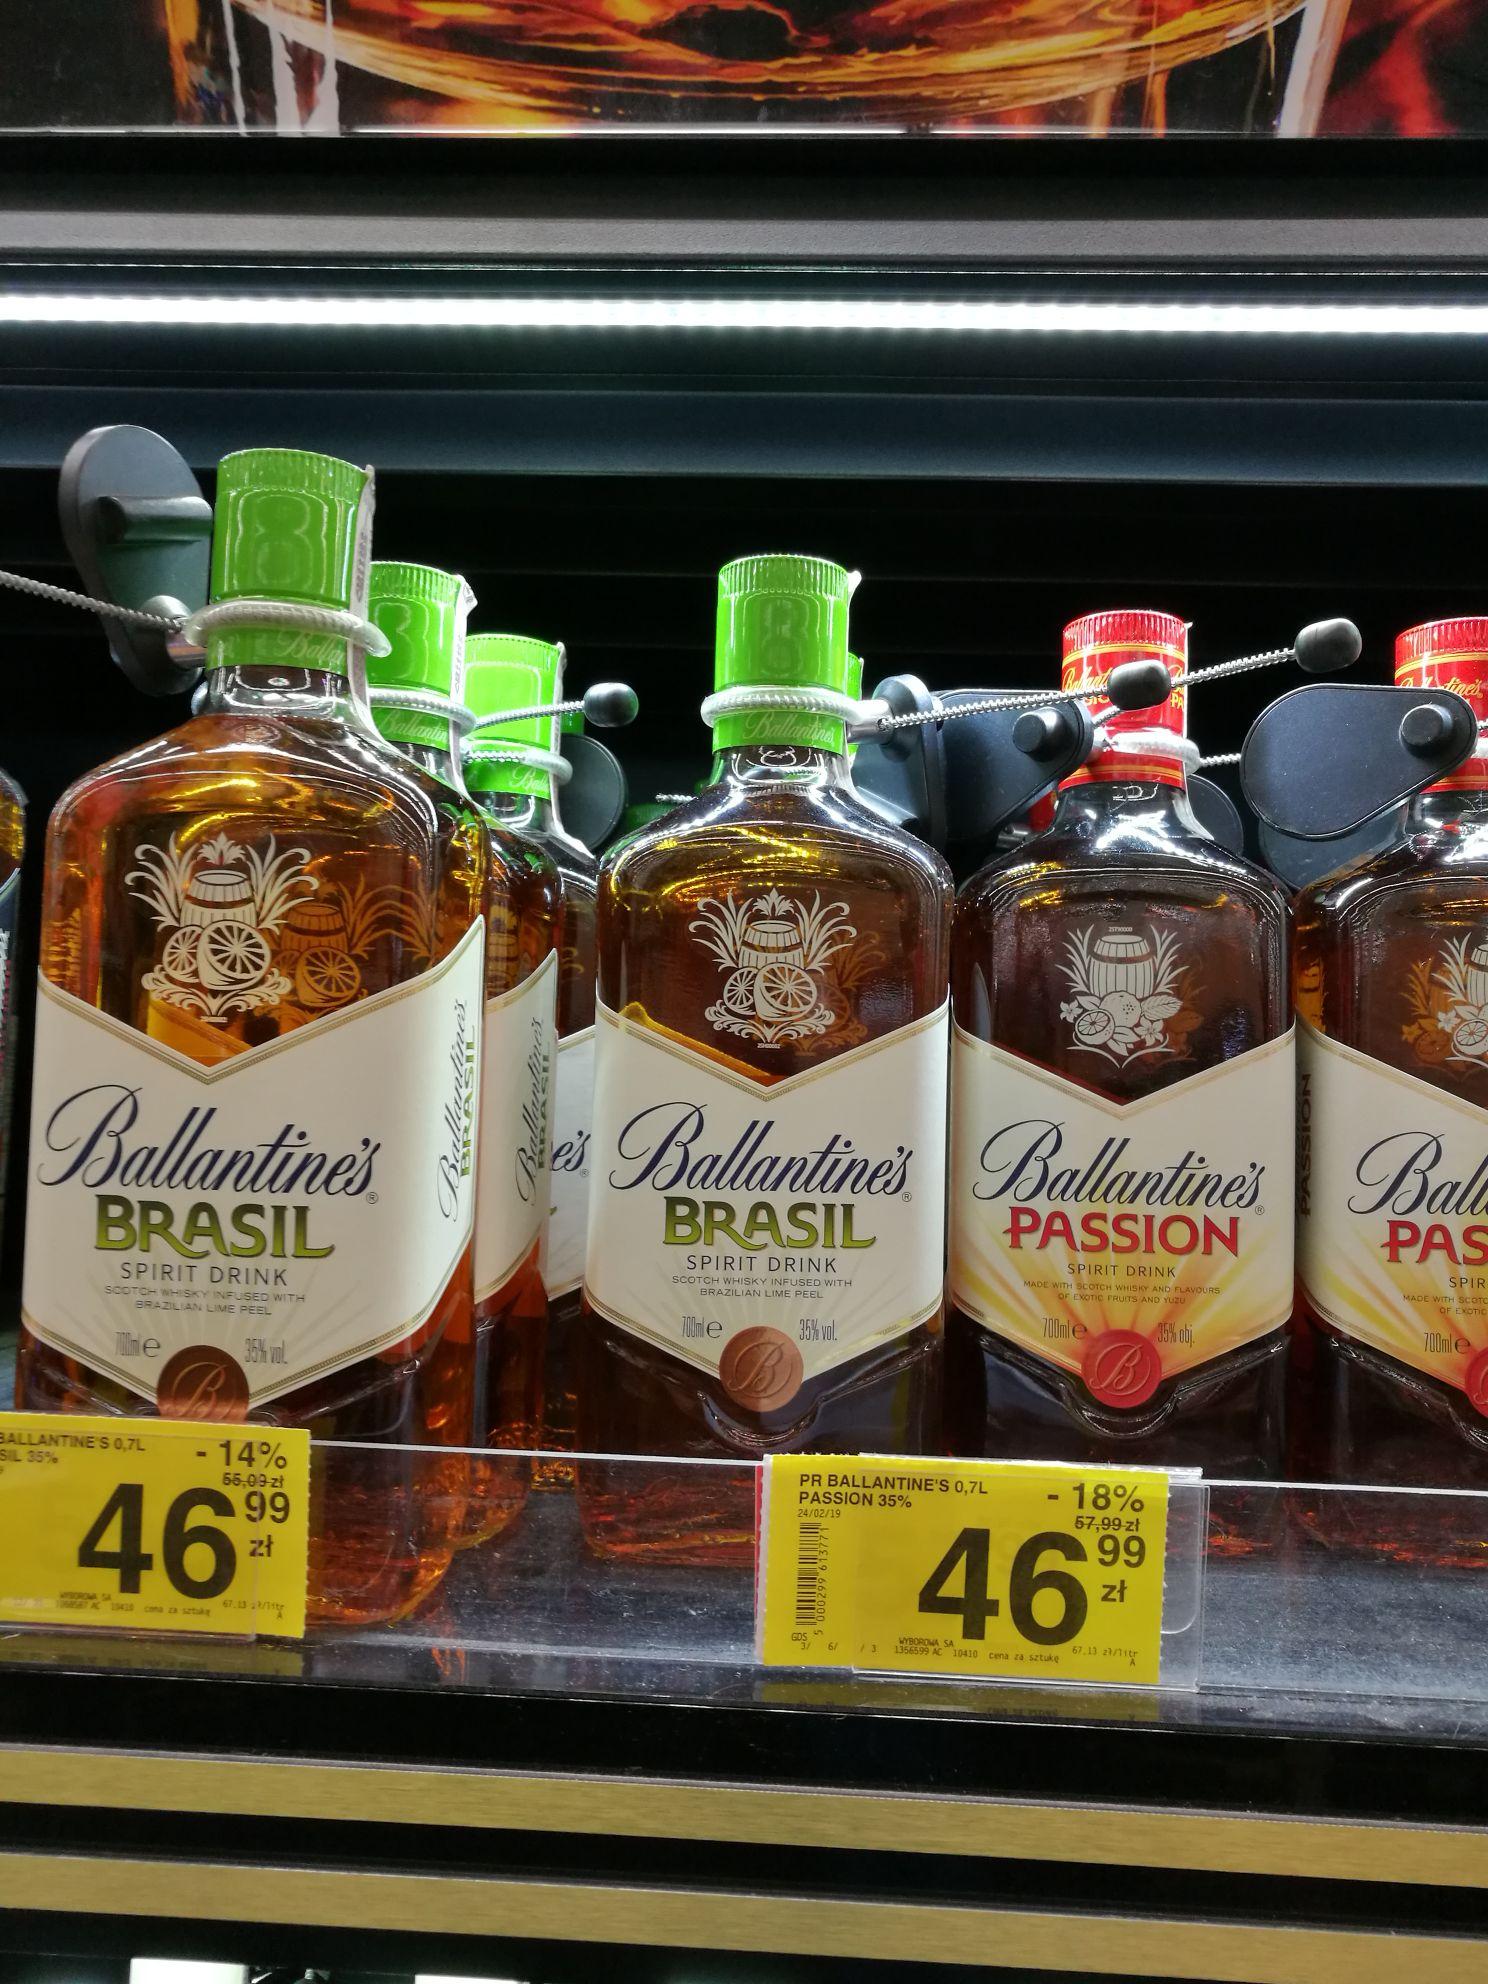 Ballantine's Passion / Brasil whisky whiskey 0,7 L - Carrefour Warszawa Bemowo